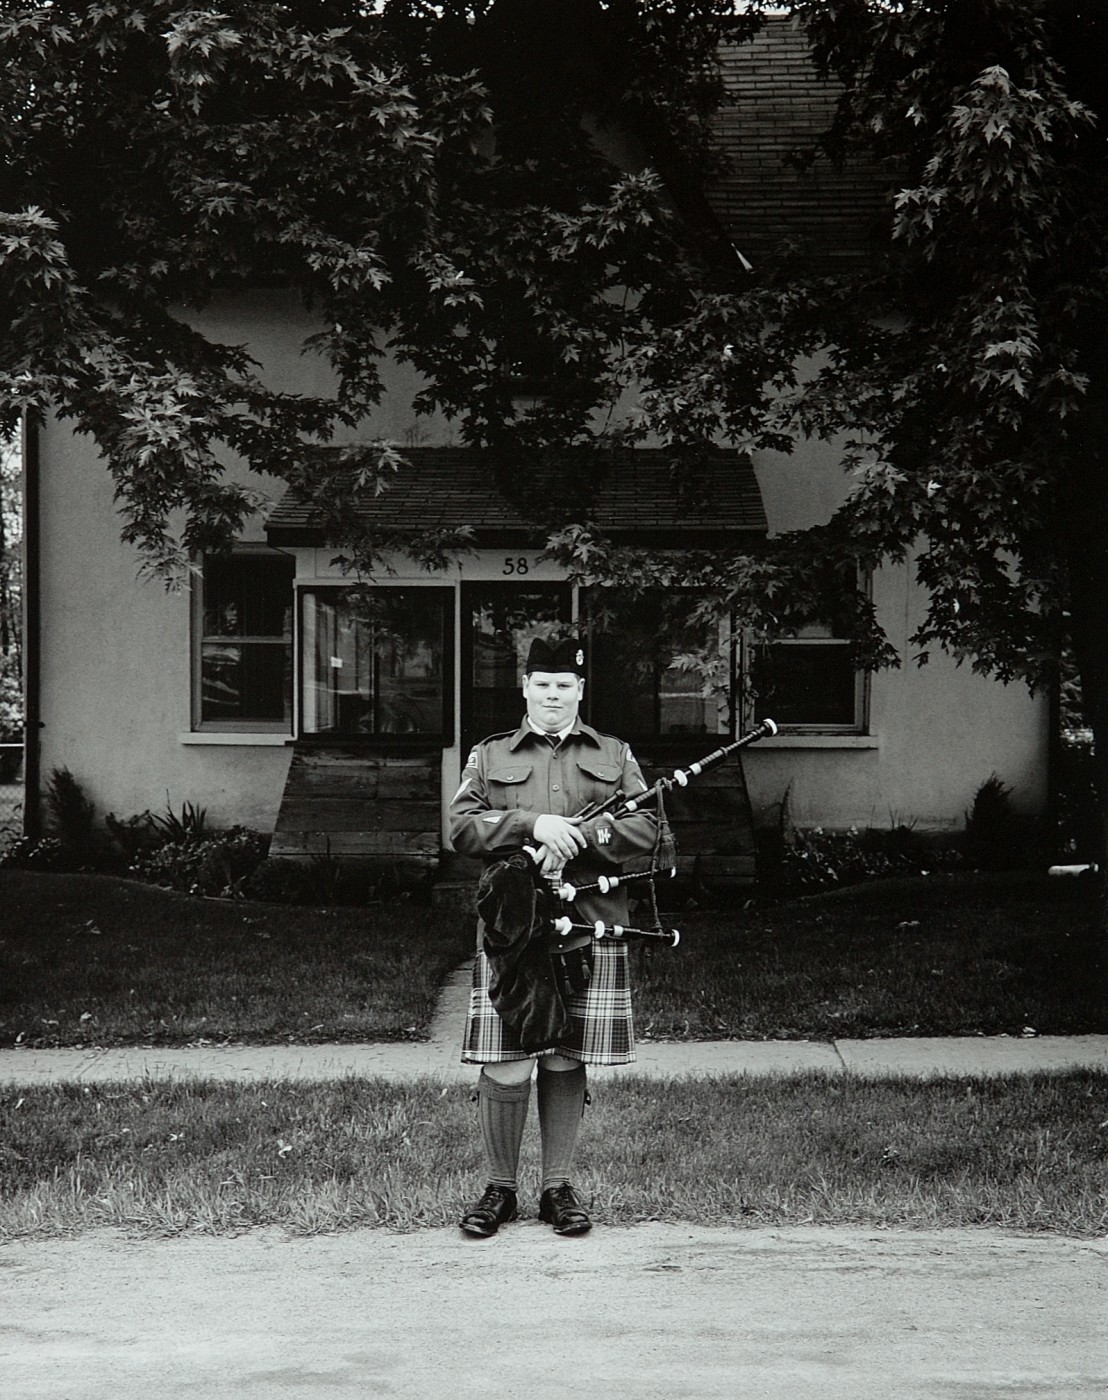 Tom Zsolt, </span><span><em>Cadet with Bagpipes, 2003</em>, </span><span>Silver Print,   13.5